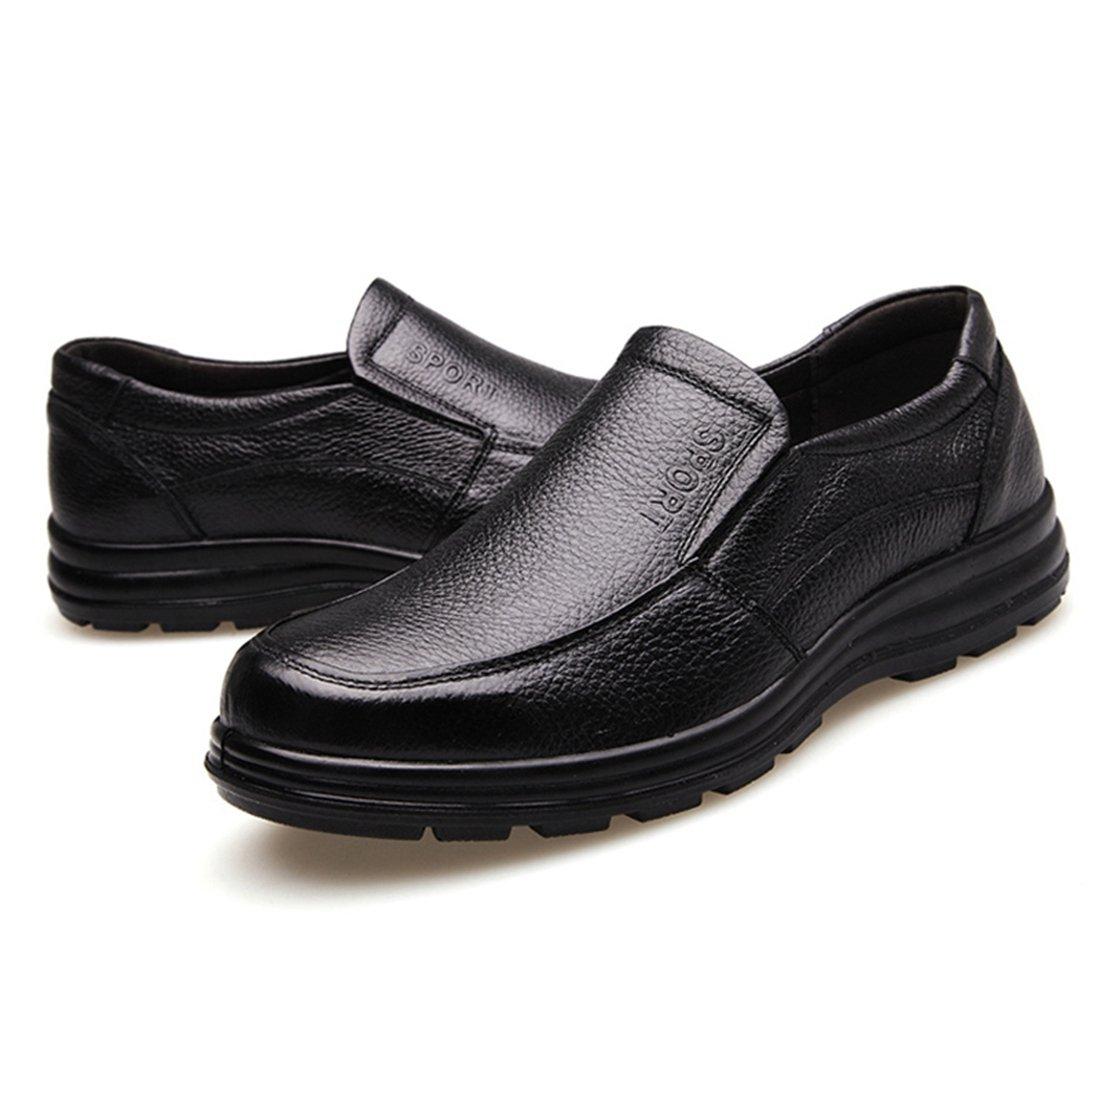 Jiyaru Mens Work Shoes Durable Restaurant Kitchen Chef Flats Business Shoe Black US 7.5